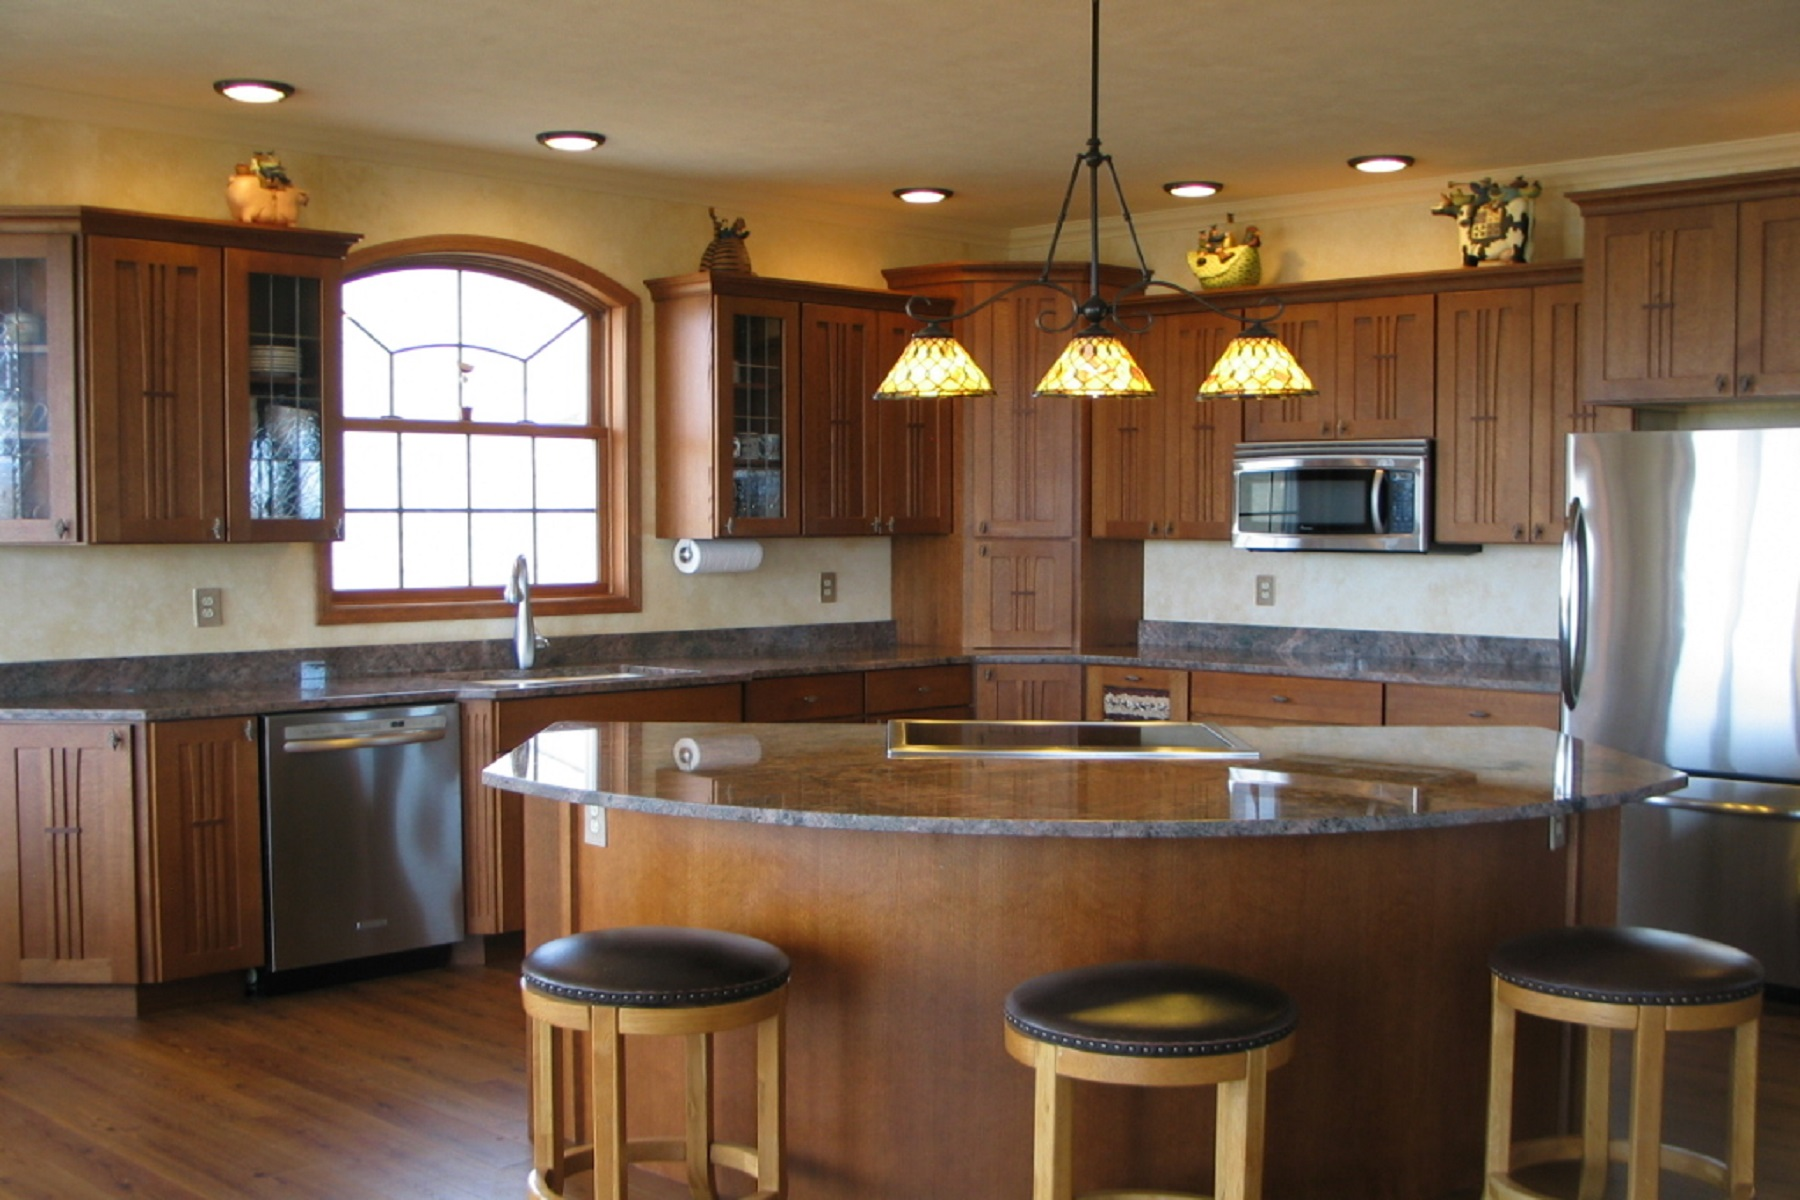 Single Family Home for Sale at 25 Tumbleweed Lane Choteau, Montana 59422 United States